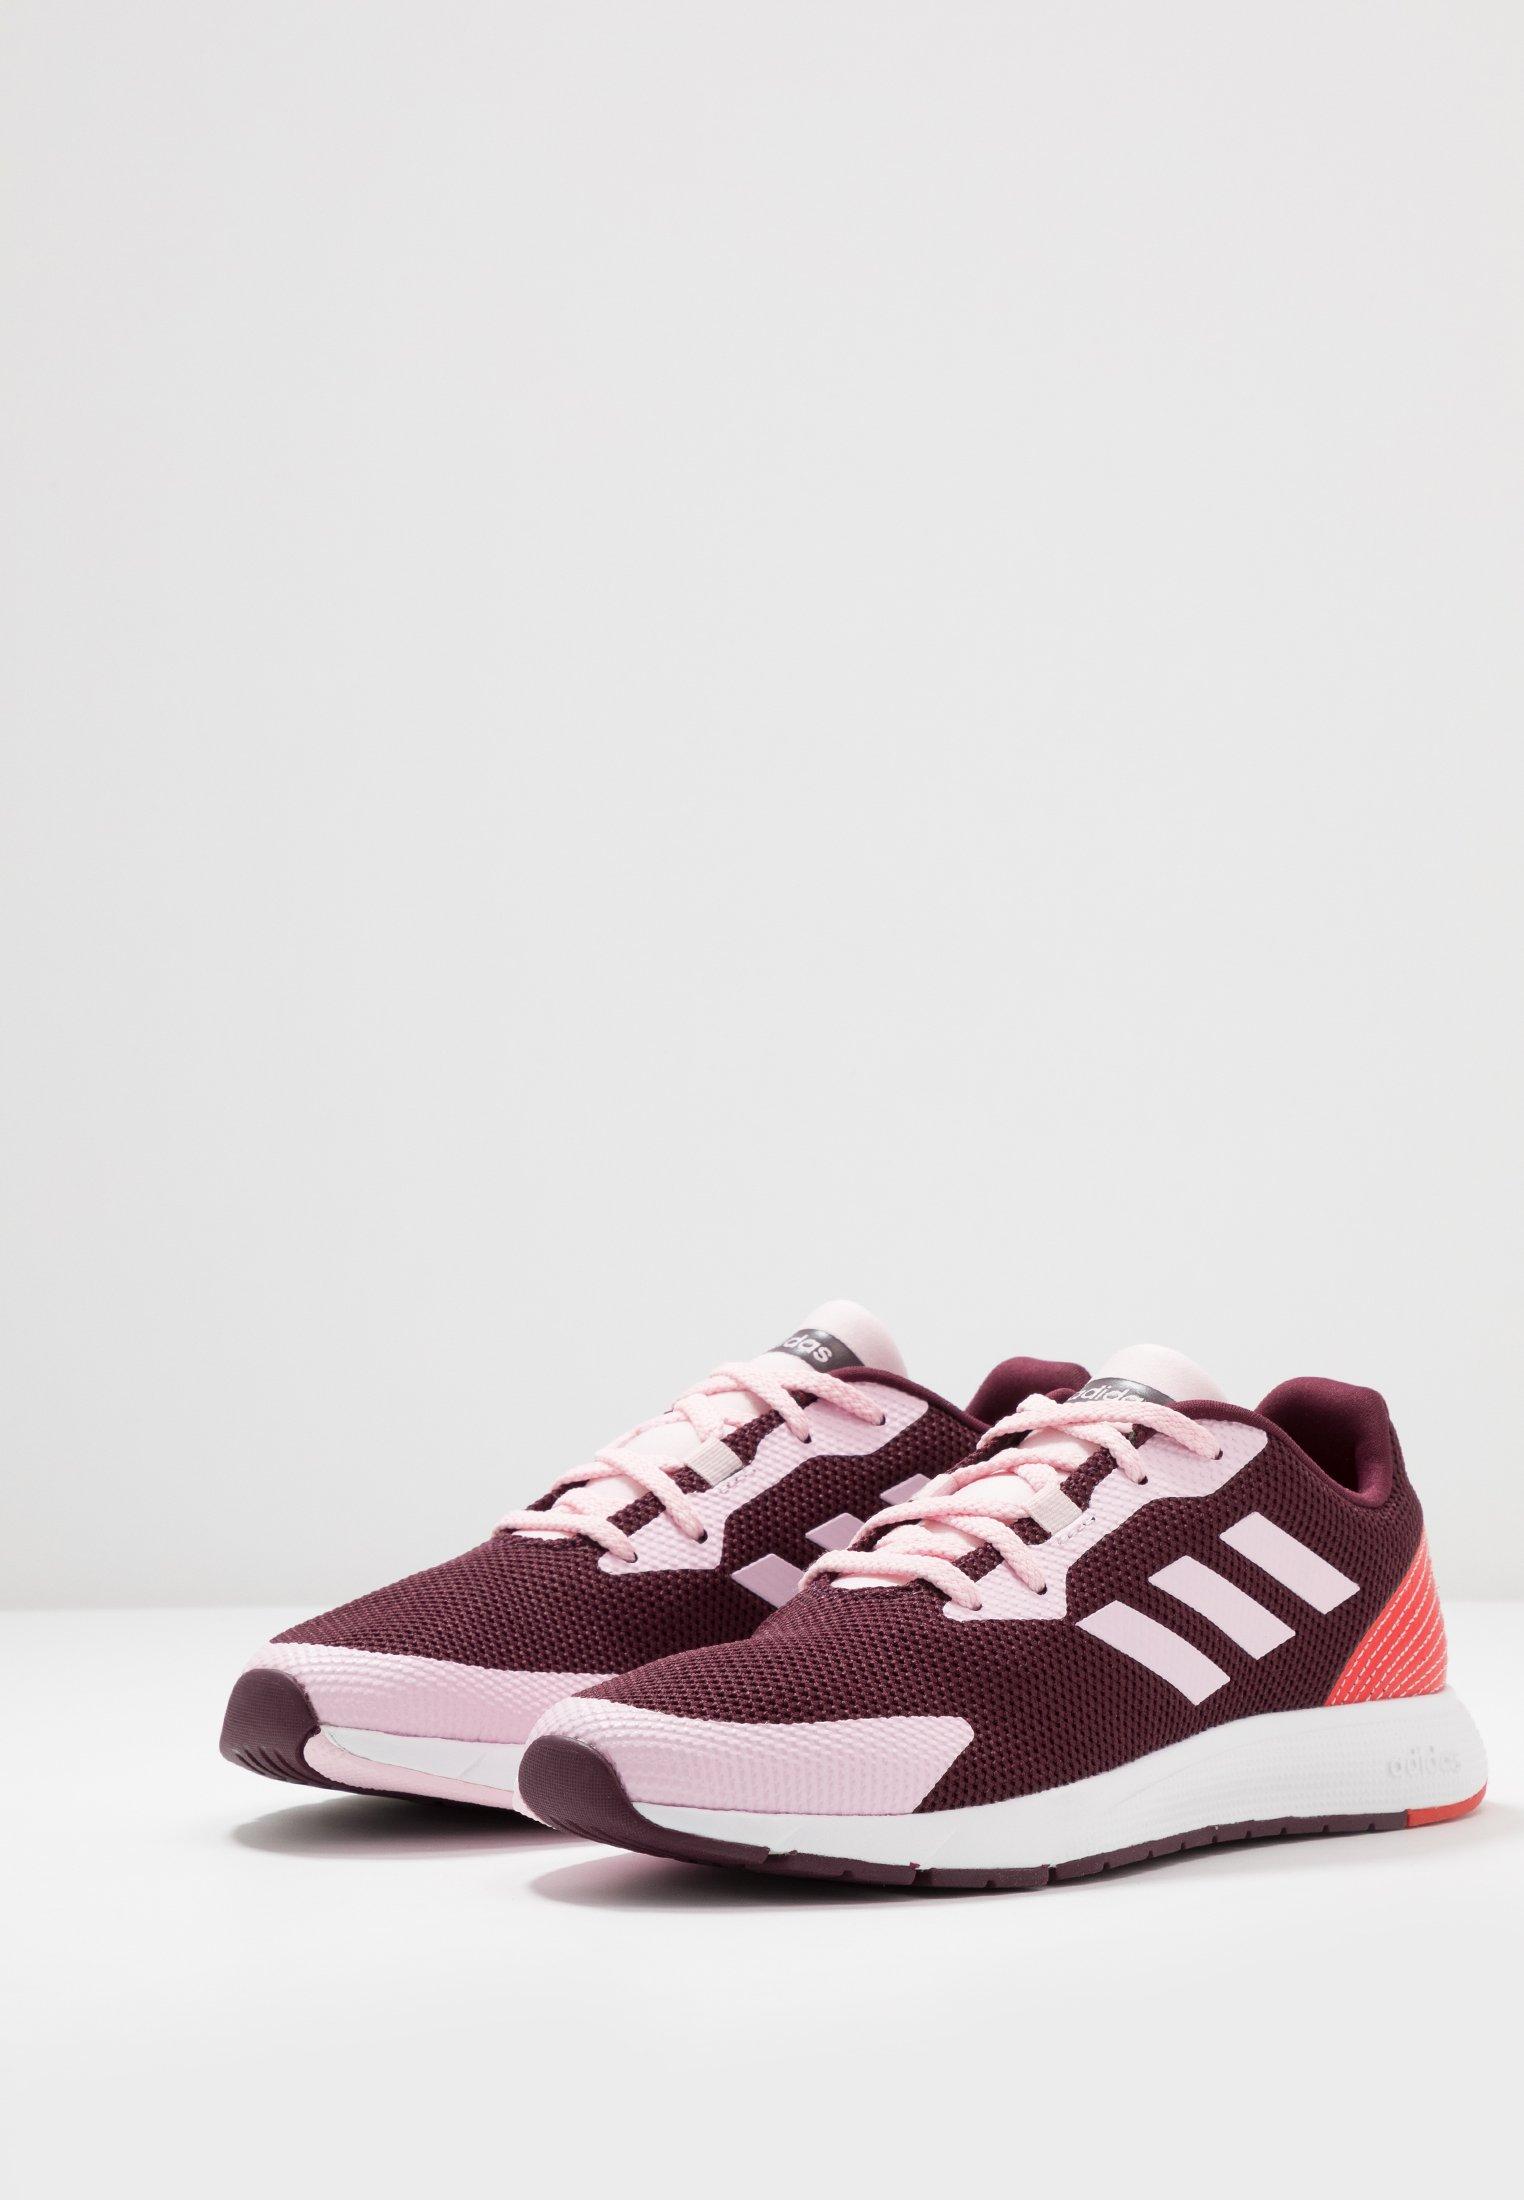 Running Red active Neutre SoorajScarpe Maroon Pink Adidas Performance clear qUGjzMLSVp